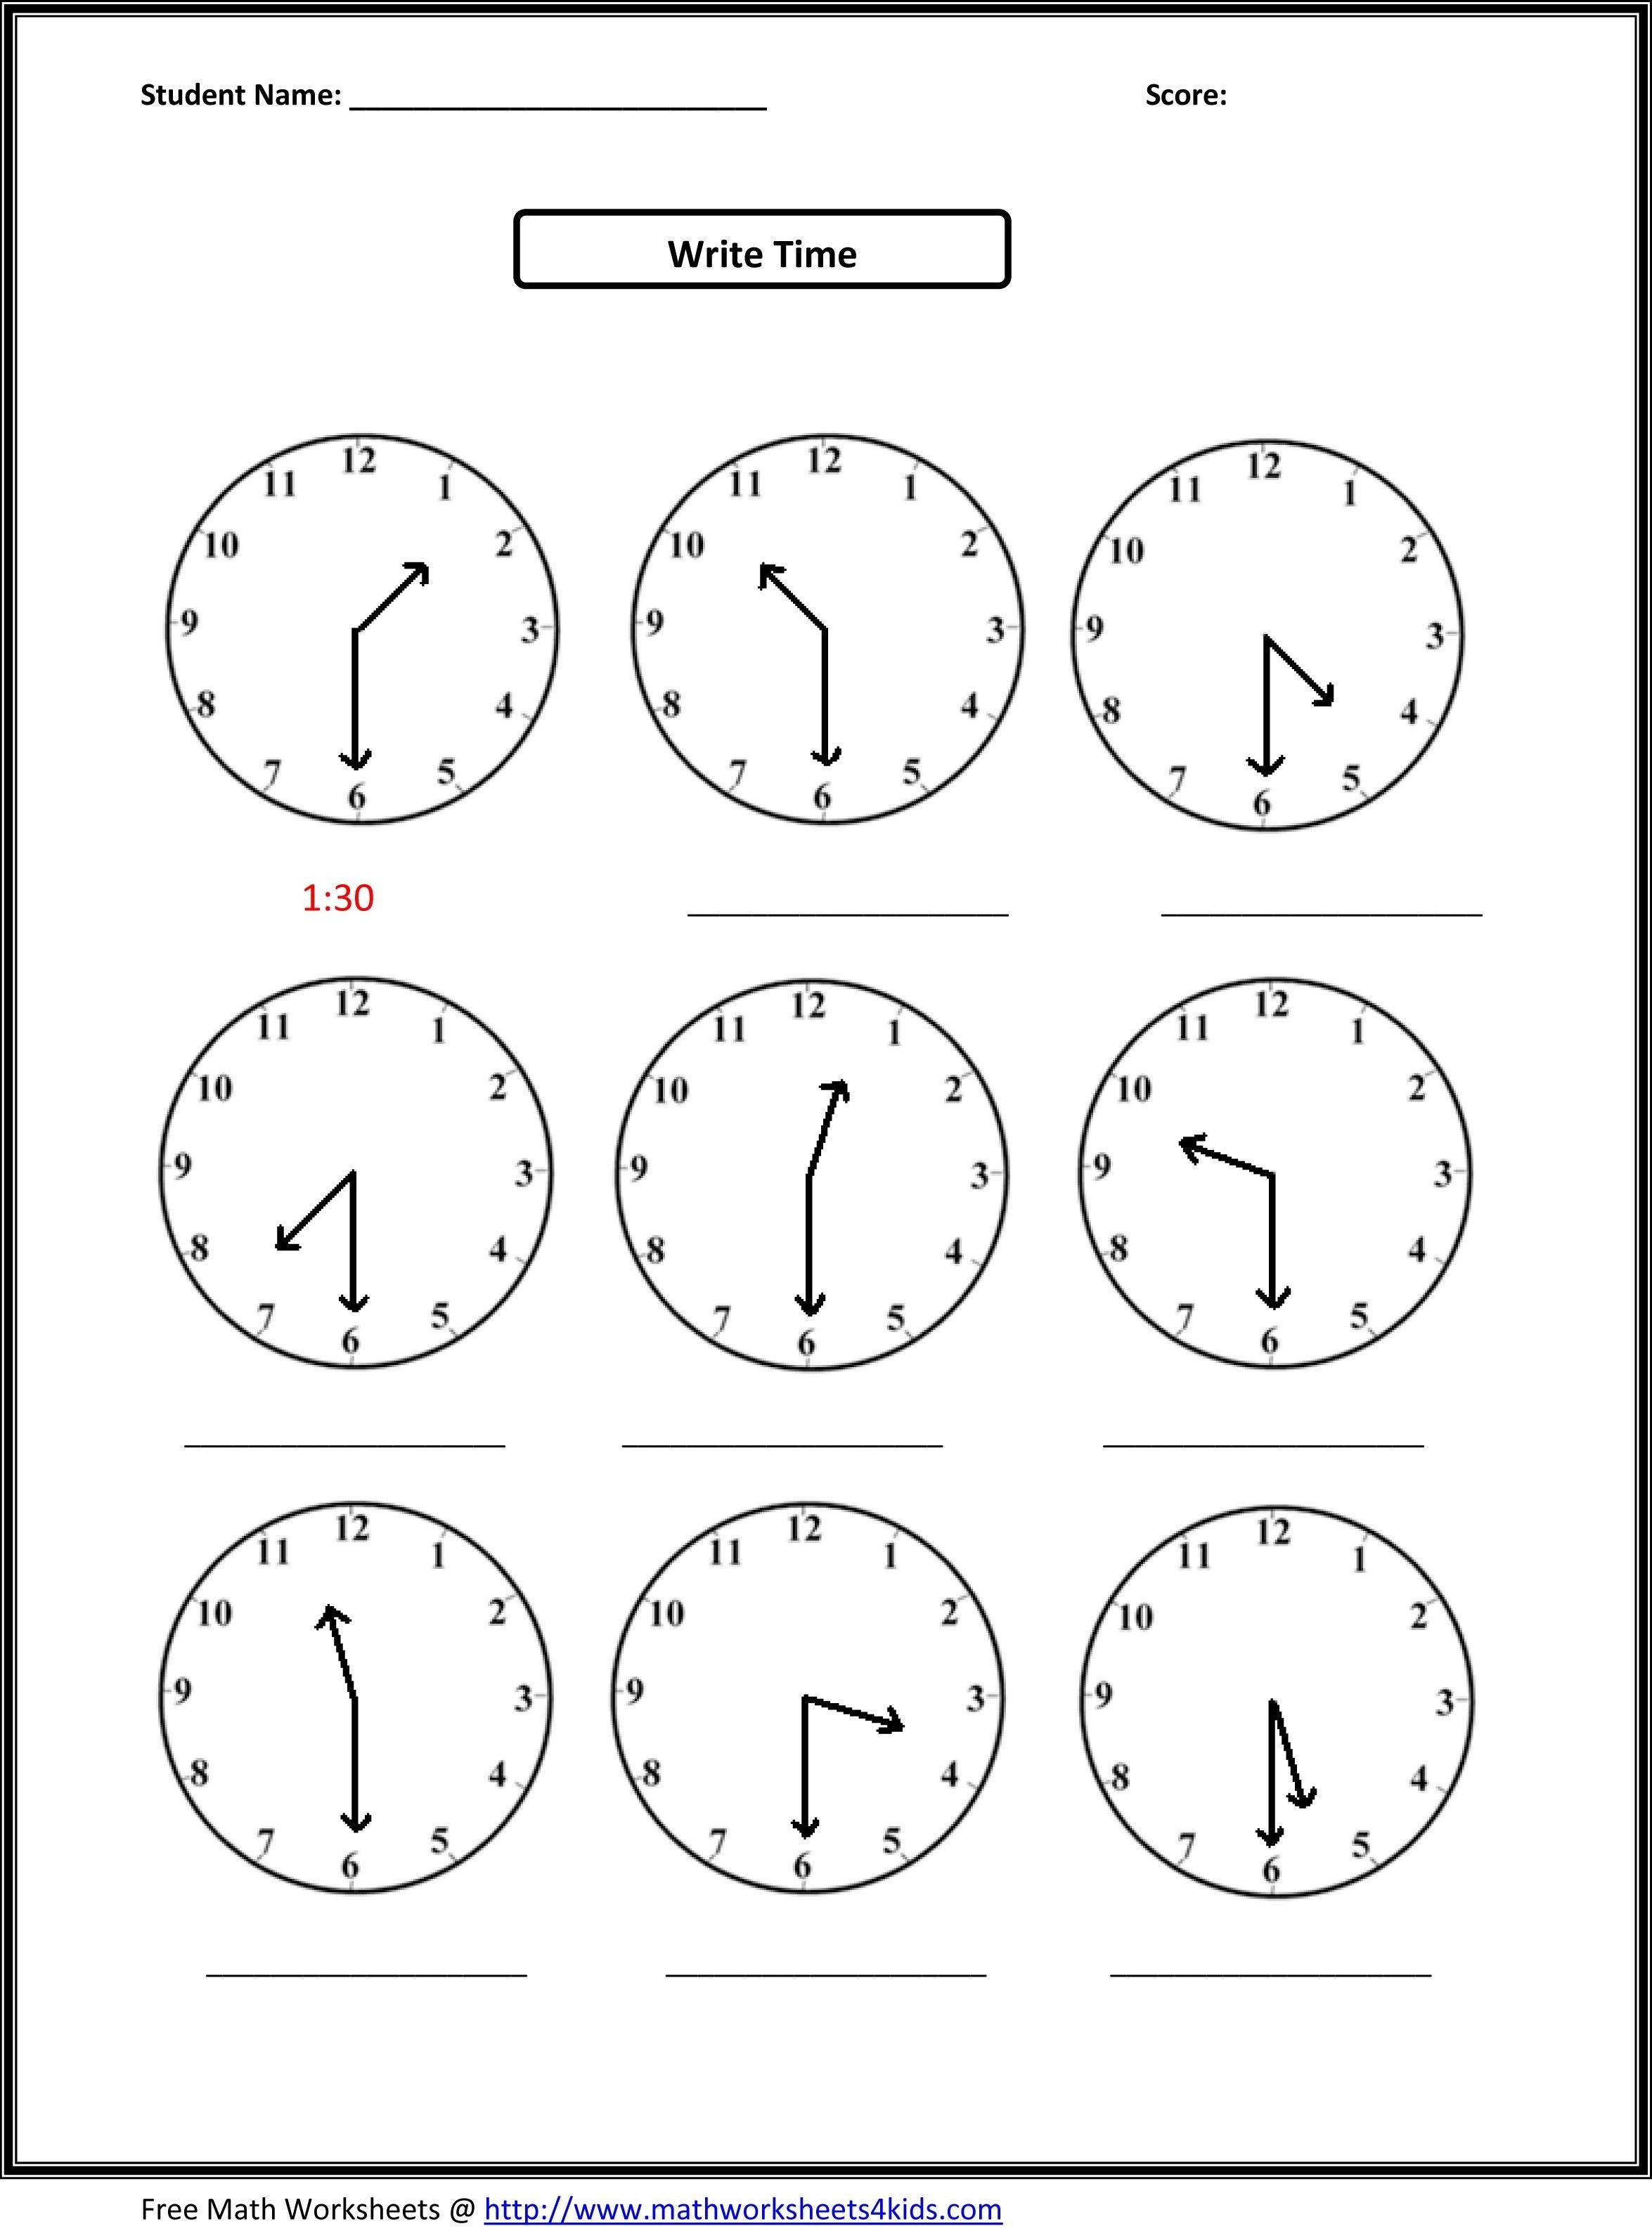 Telling Time Worksheets Ks3 New Clock Grade 3 Free Maths Printables | Printable Time Worksheets Grade 3